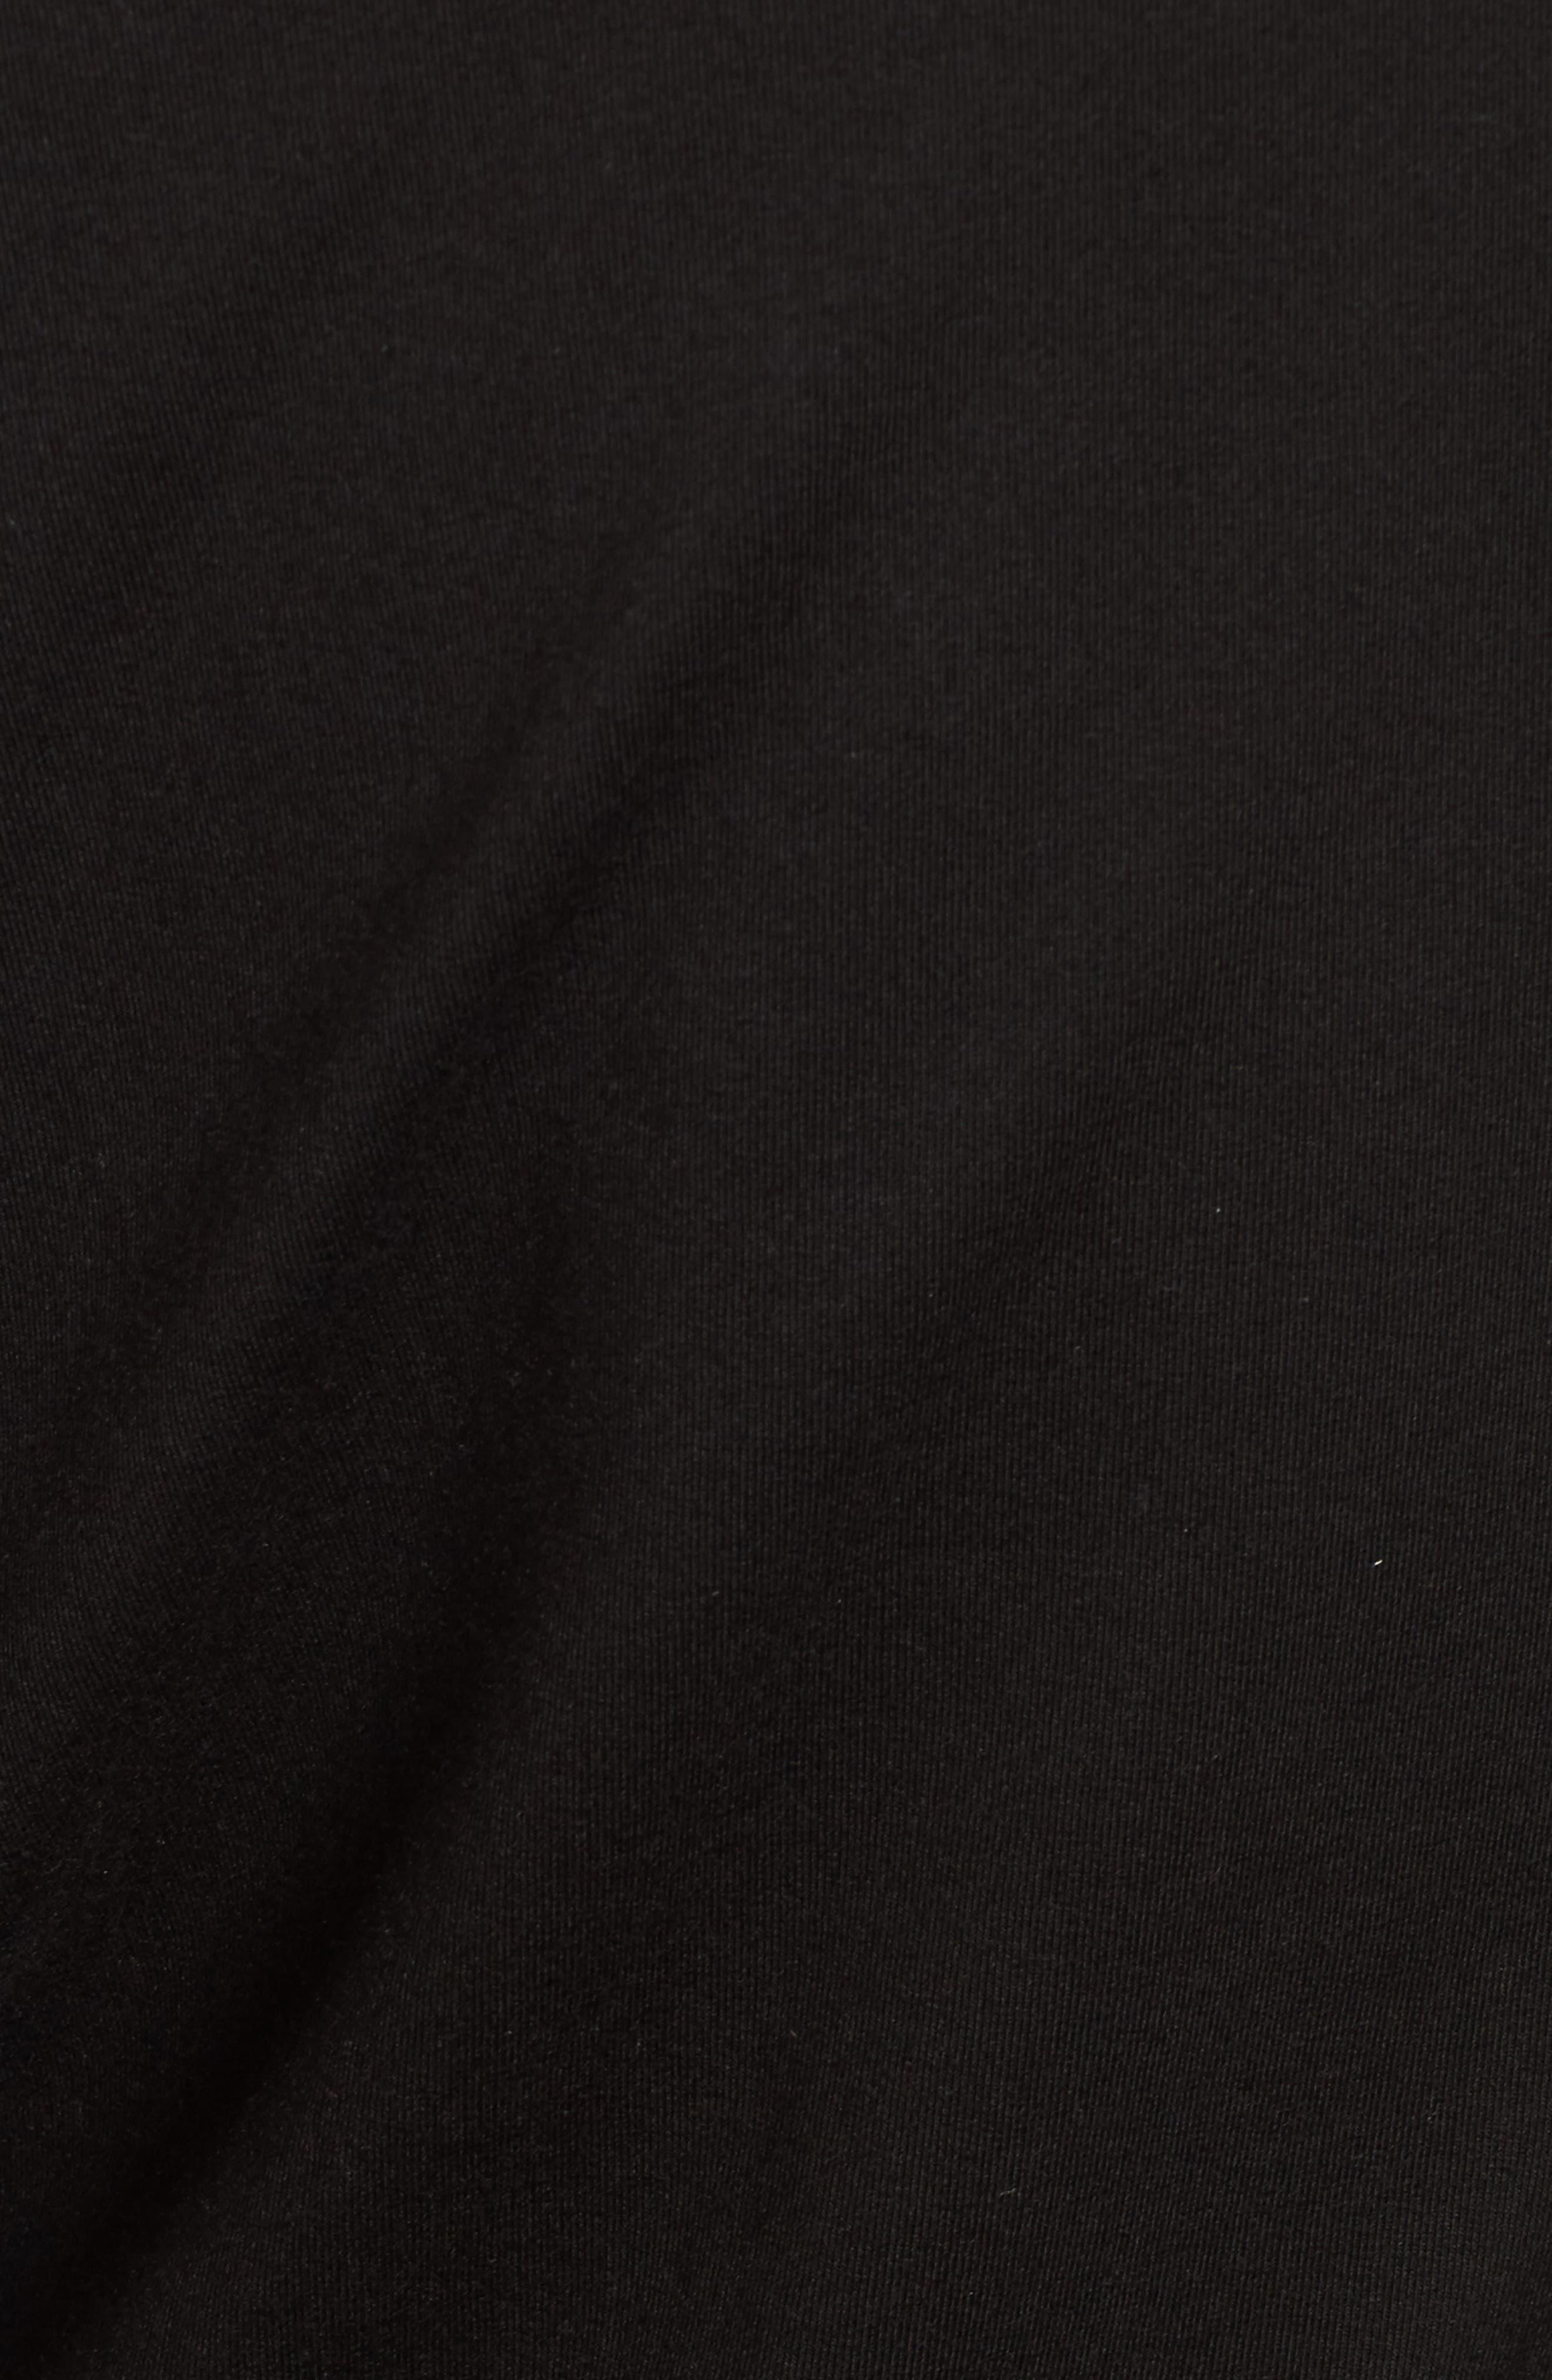 Embellished Sweatshirt,                             Alternate thumbnail 5, color,                             001